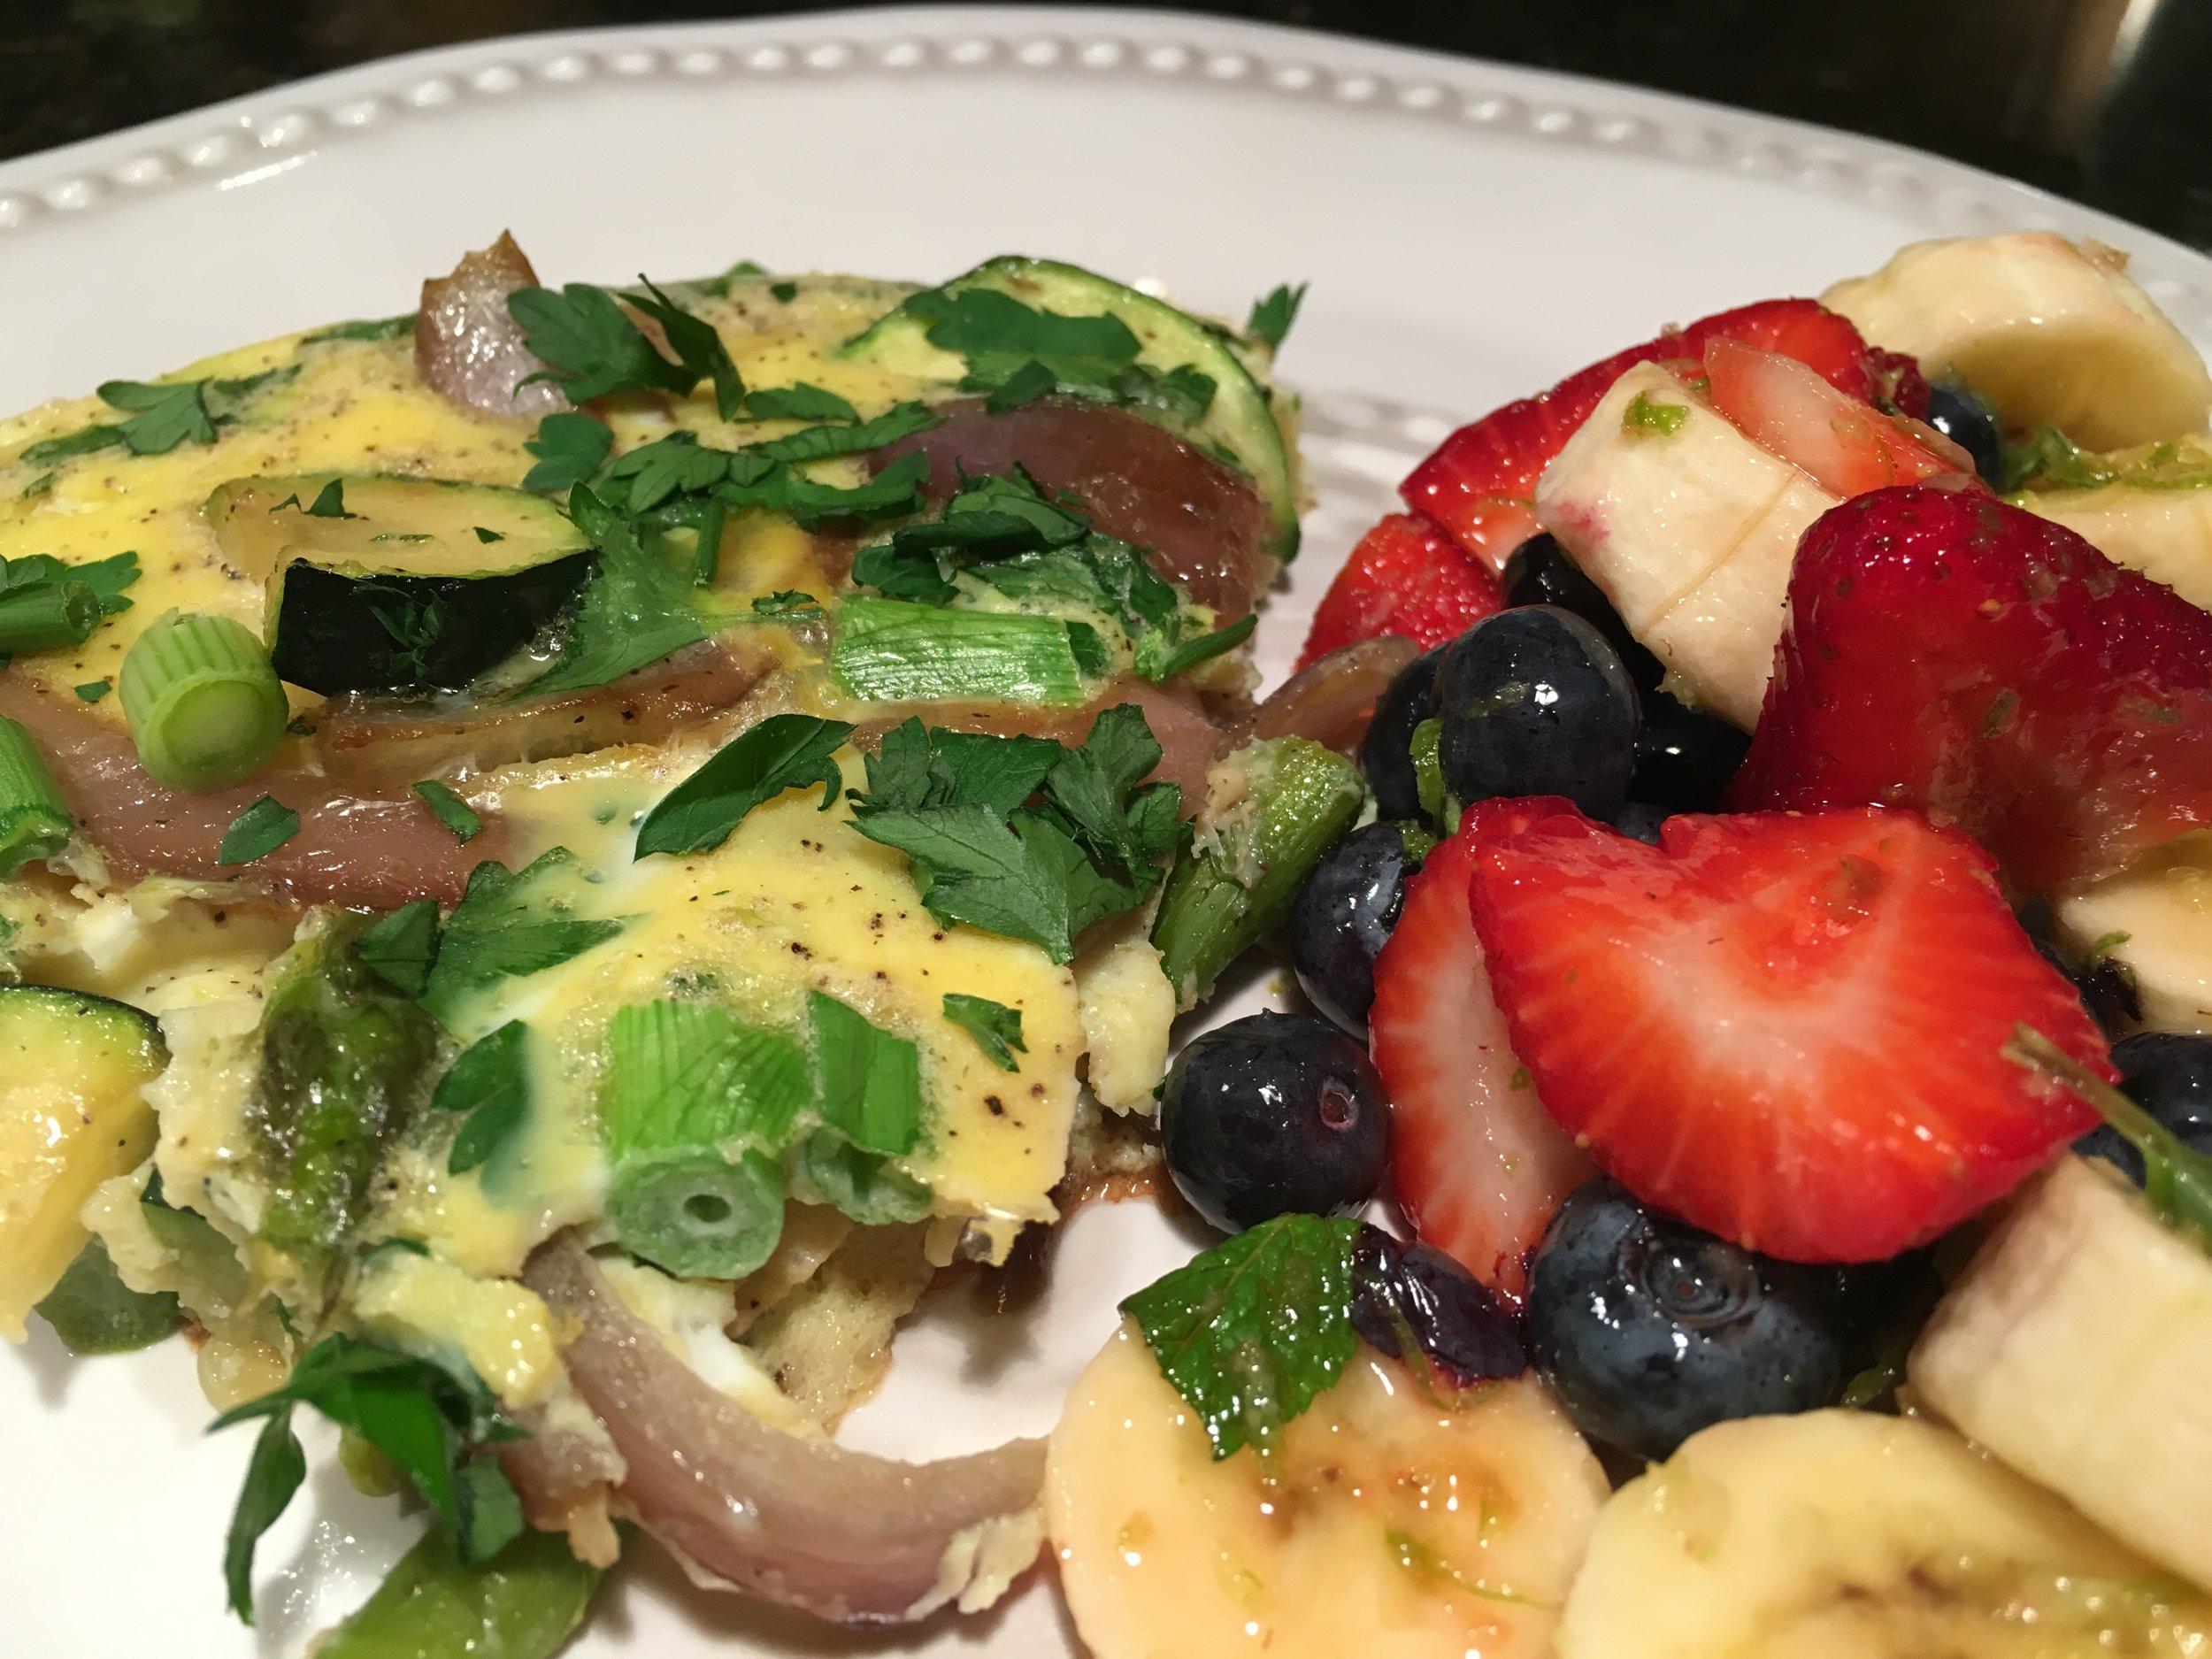 Breakfast for Dinner - Asparagus%2c Zucchini%2c & Herb Frittata w Fruit Salad.JPG